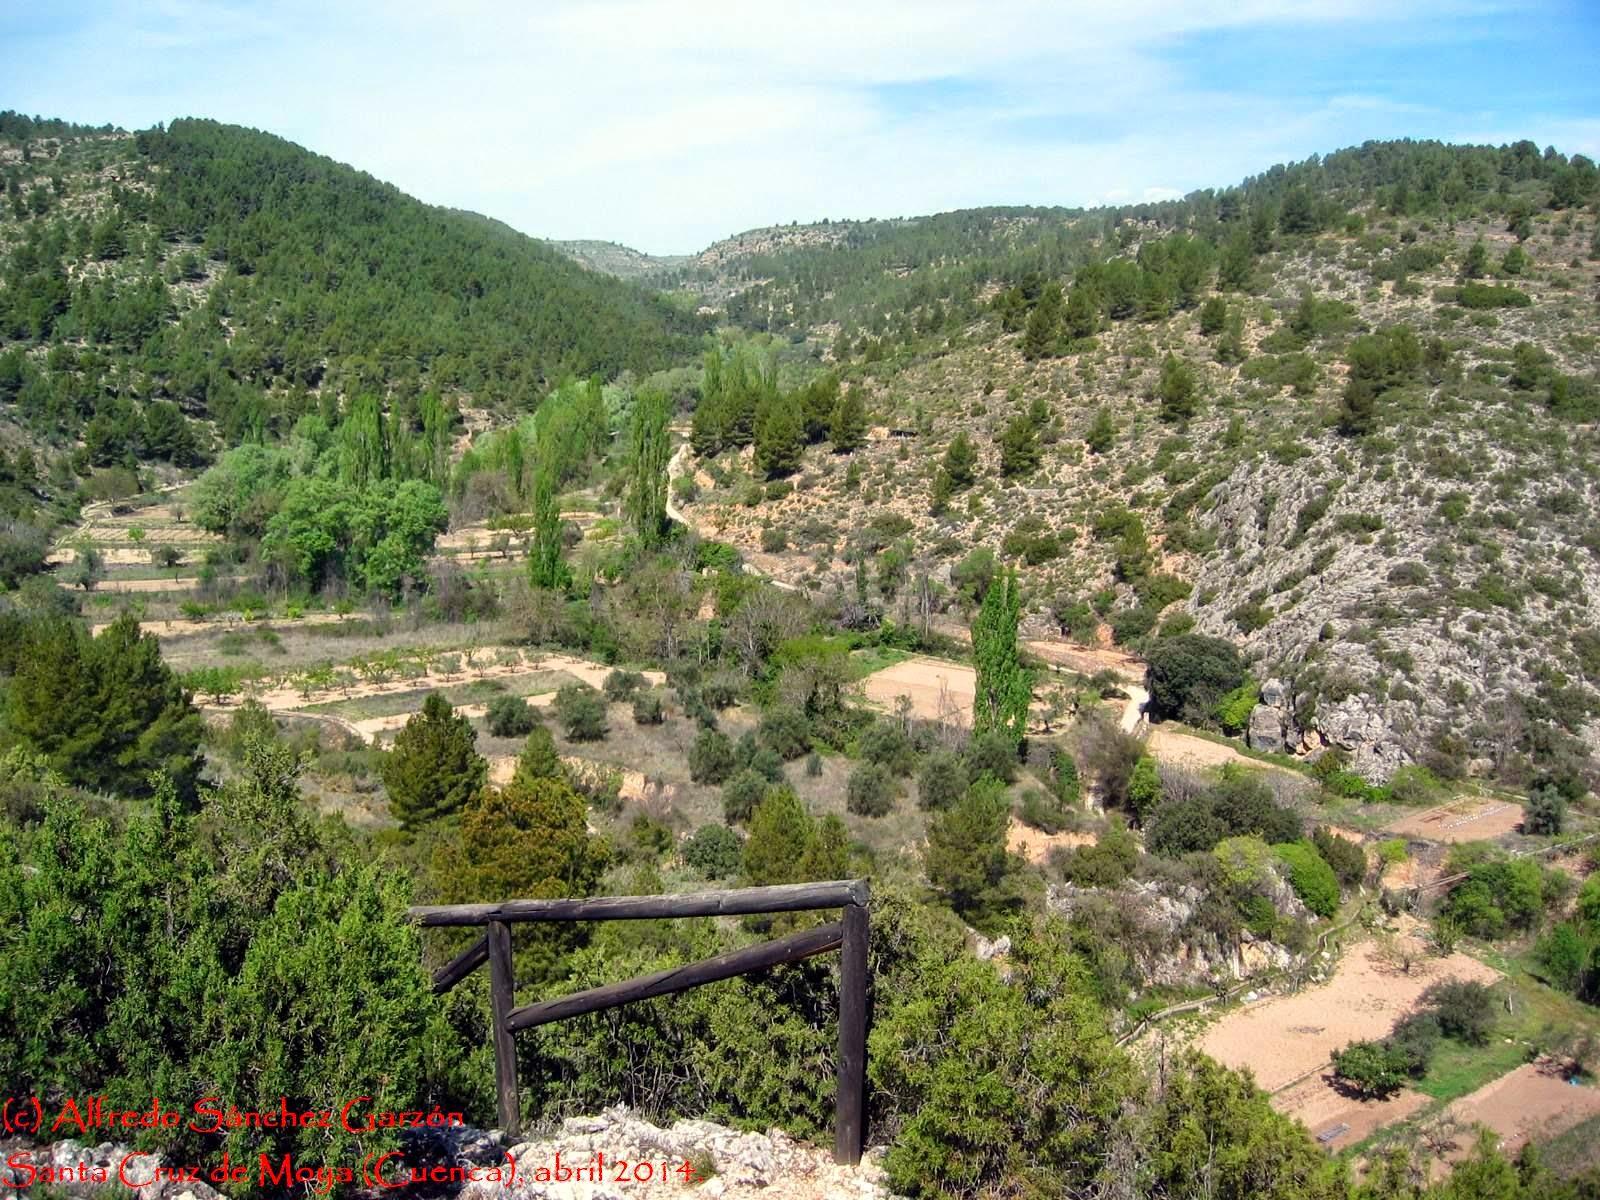 camino-rento-asturias-cuenca